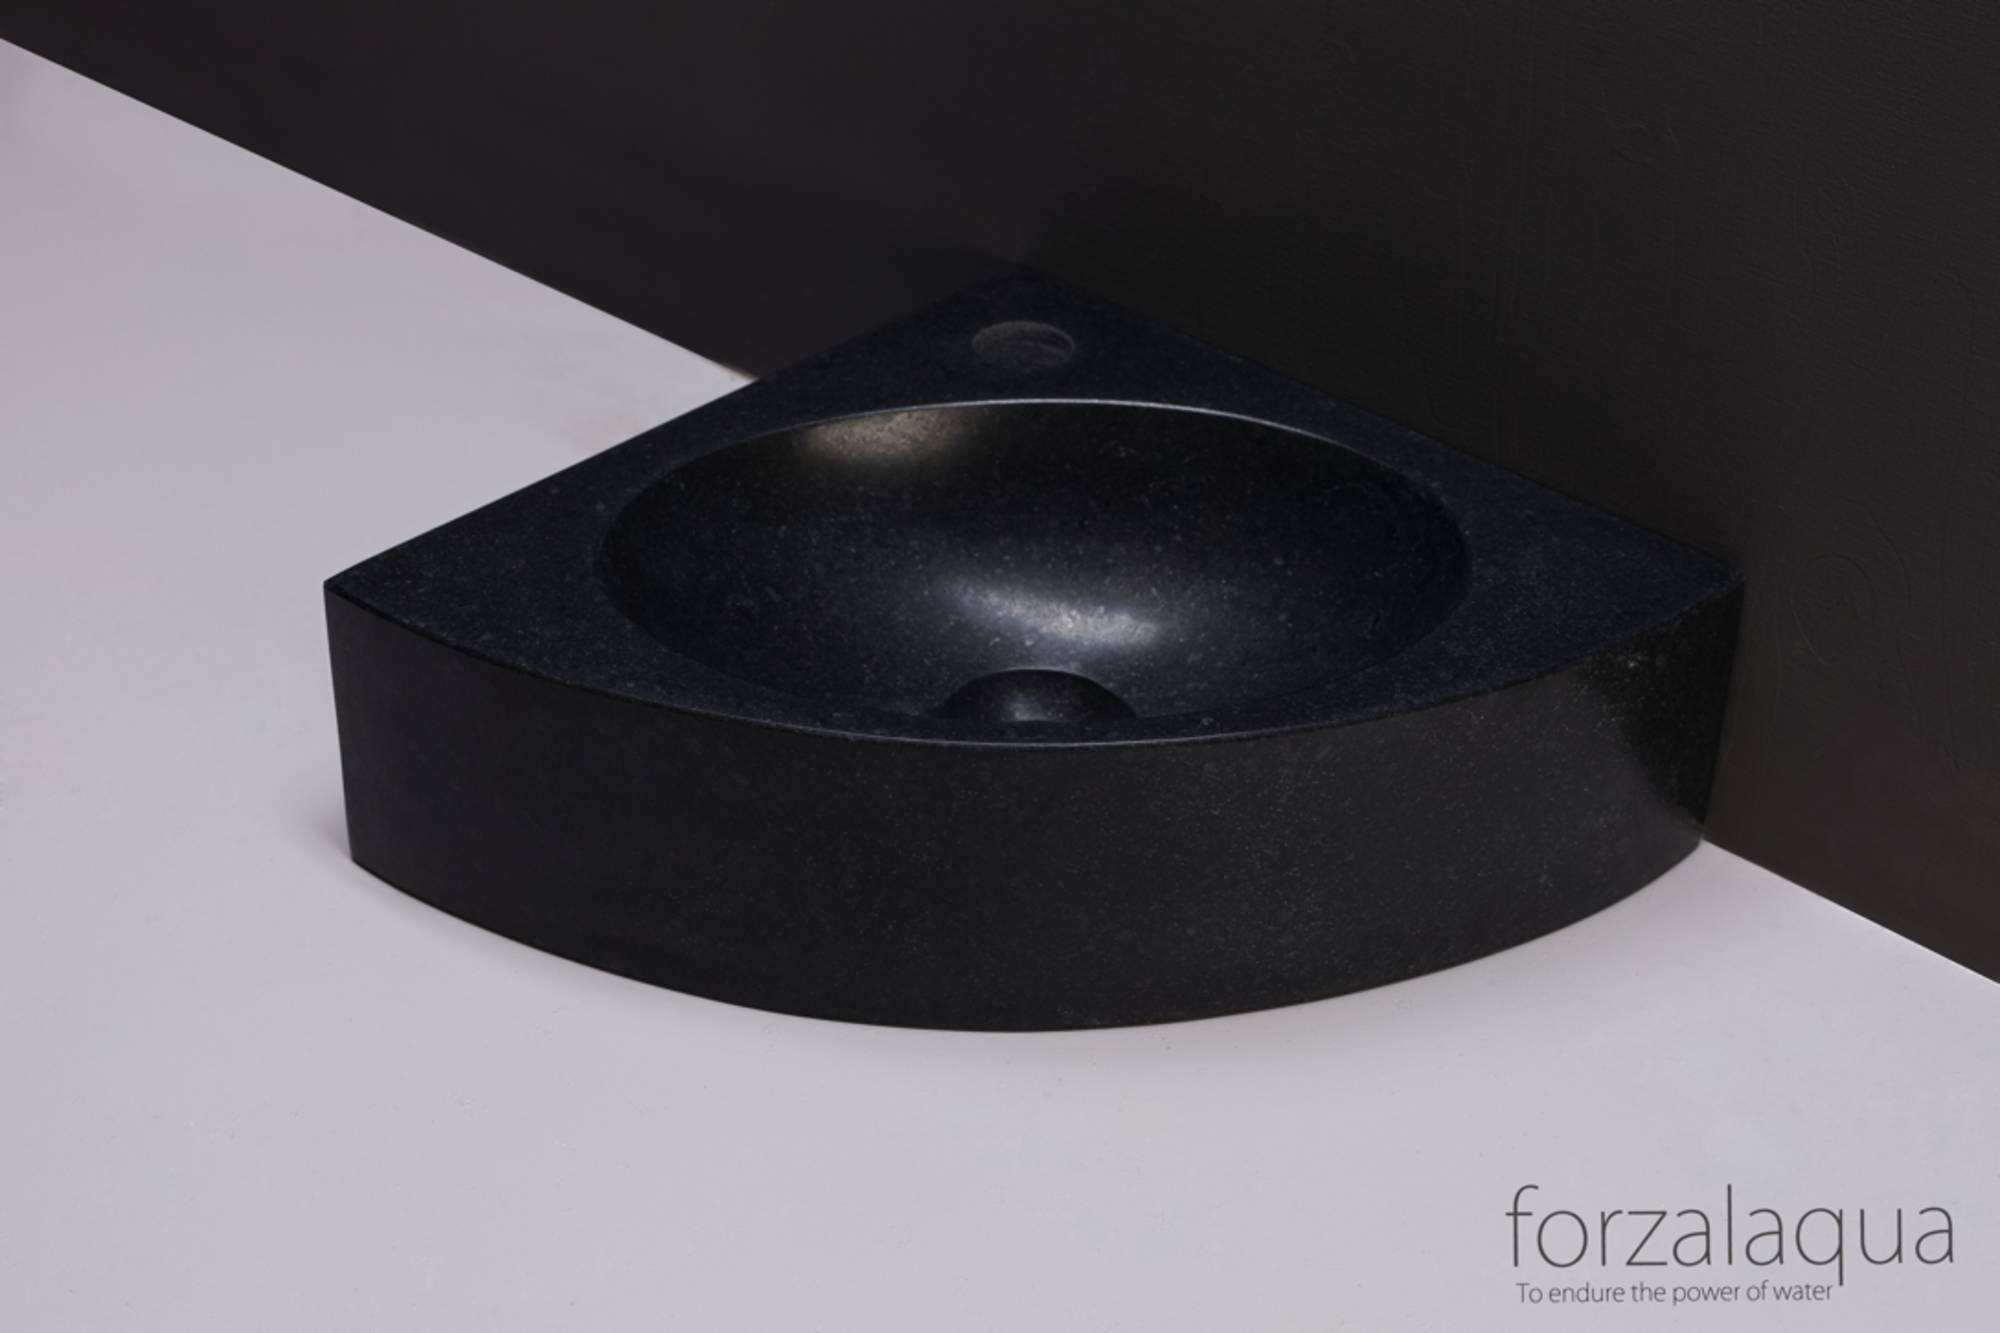 Forzalaqua Turino fontein 30x30x10 cm Graniet